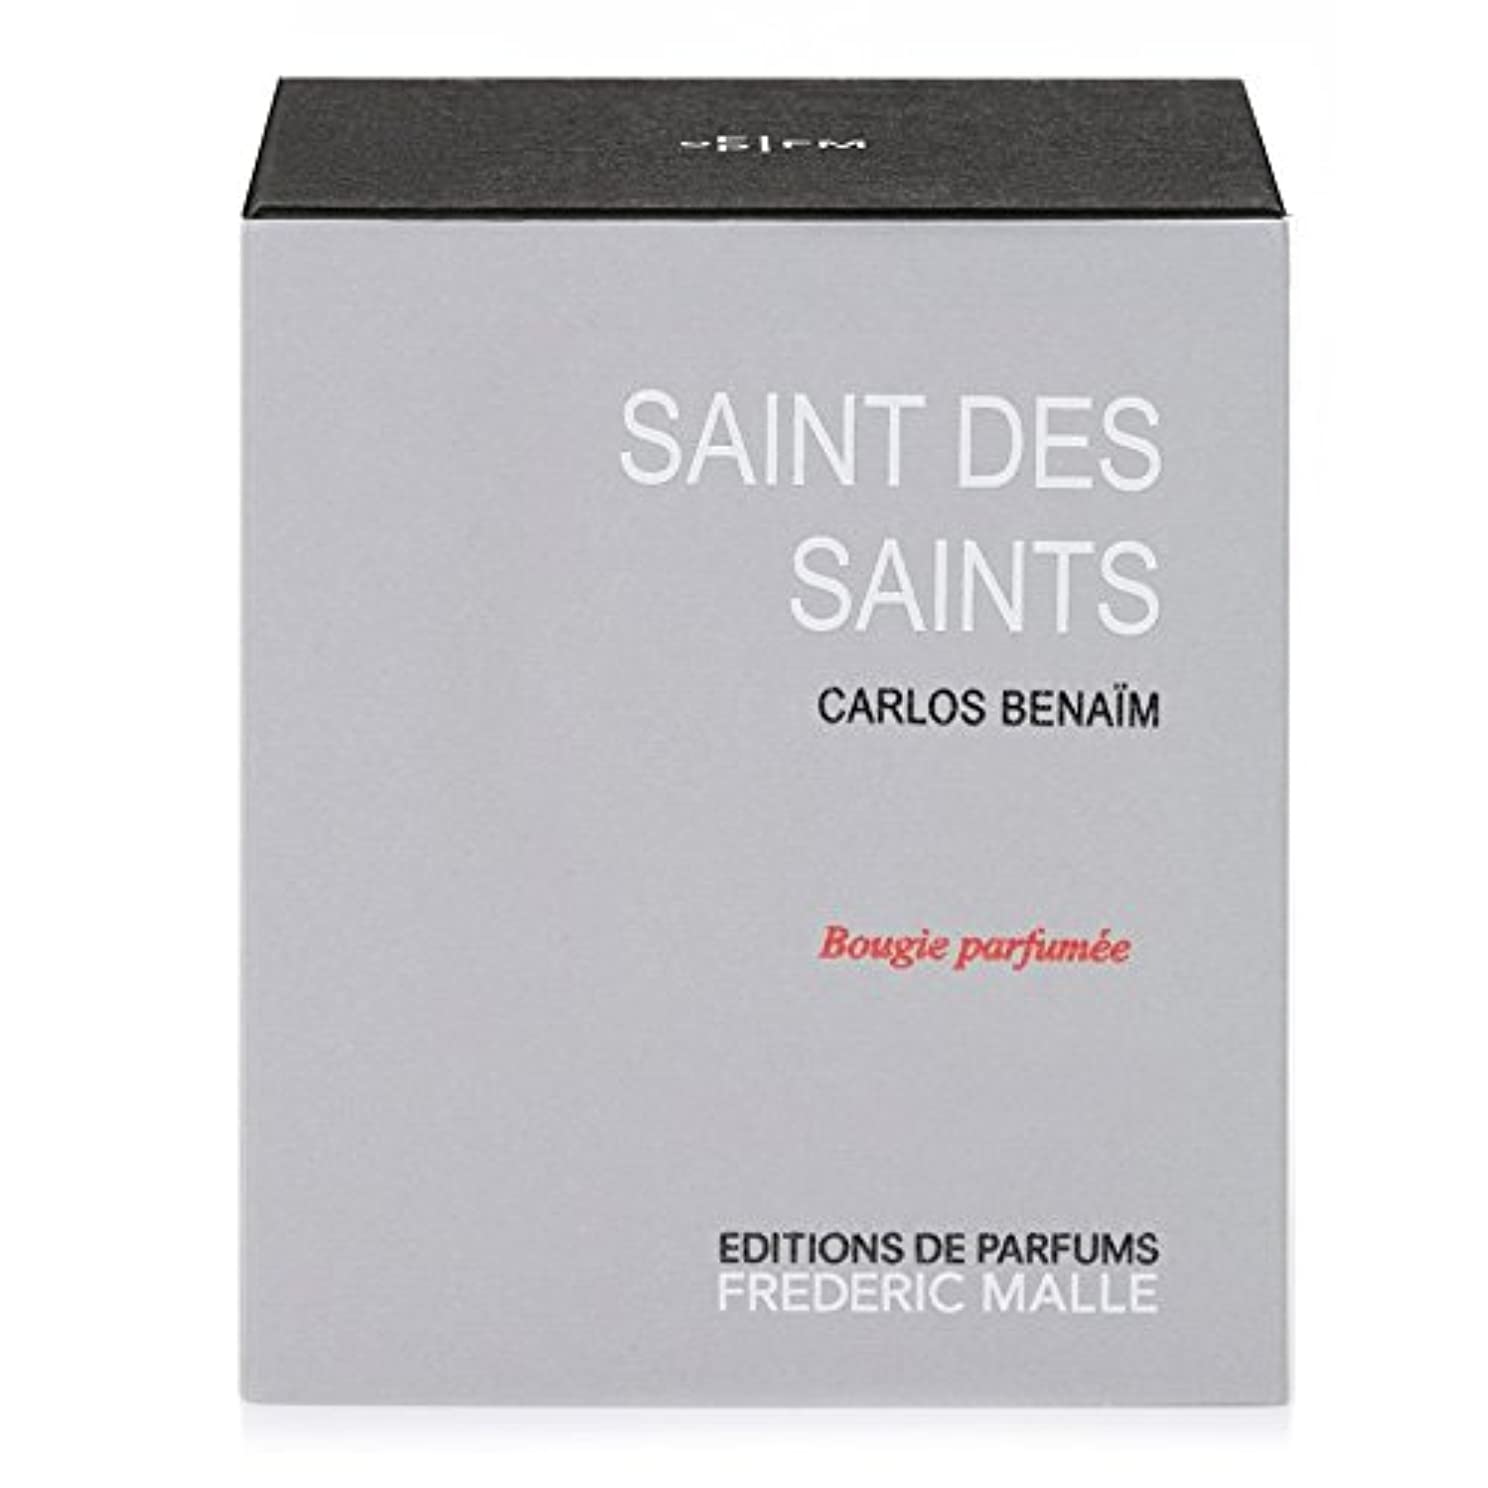 Frederic Malle Saint Des Saints Scented Candle 220g - フレデリック?マル聖人デ聖人の香りのキャンドル220グラム [並行輸入品]